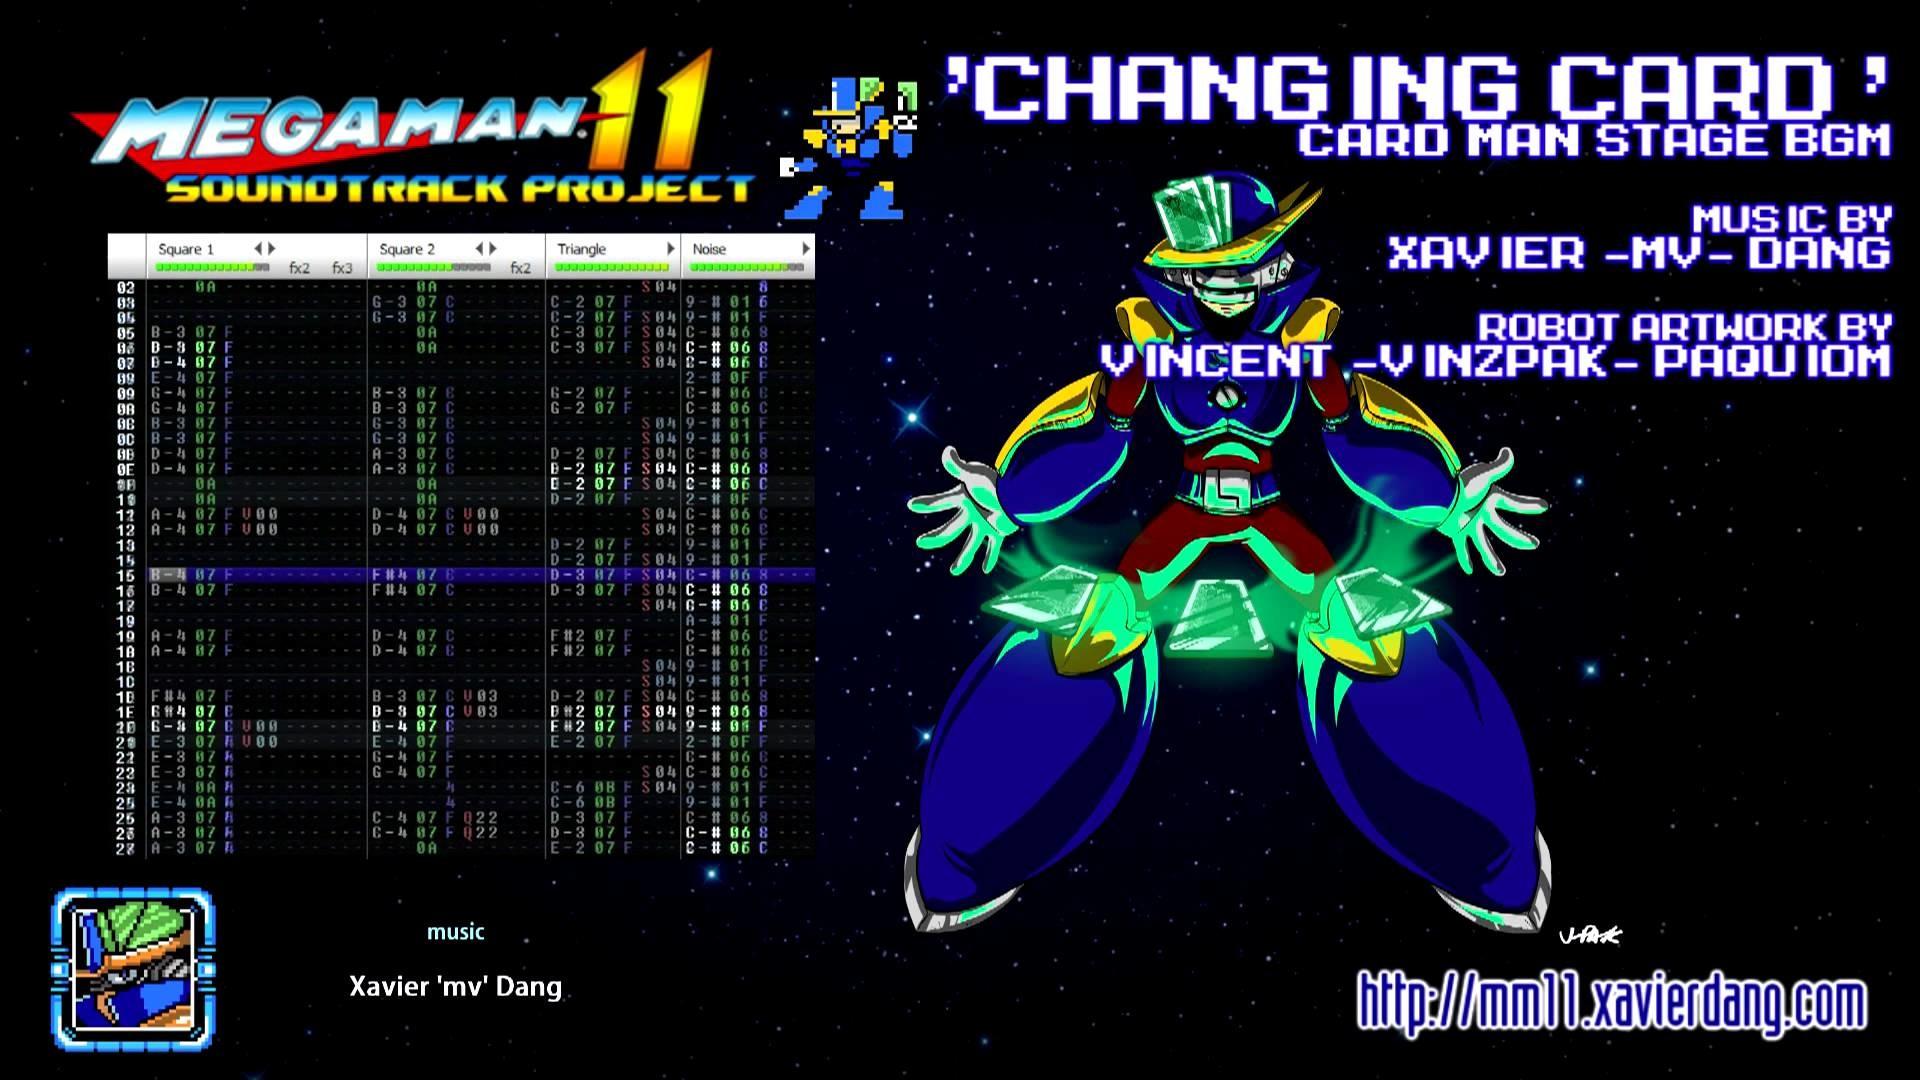 CHANGING CARD (CARD MAN STAGE) — MEGA MAN 11 soundtrack project